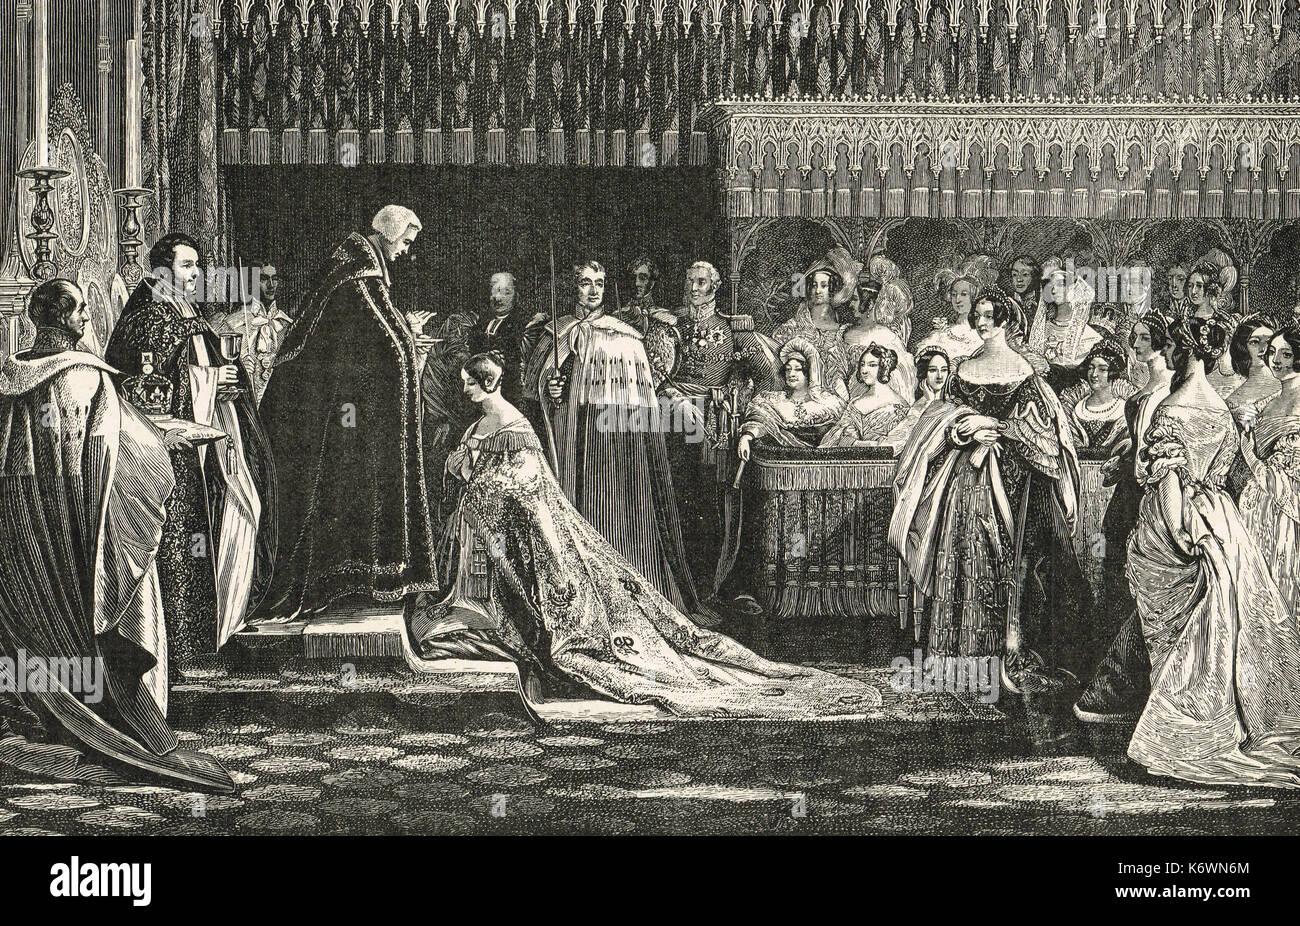 Coronation of Queen Victoria, 28 June 1838, Victoria receiving the sacrament - Stock Image